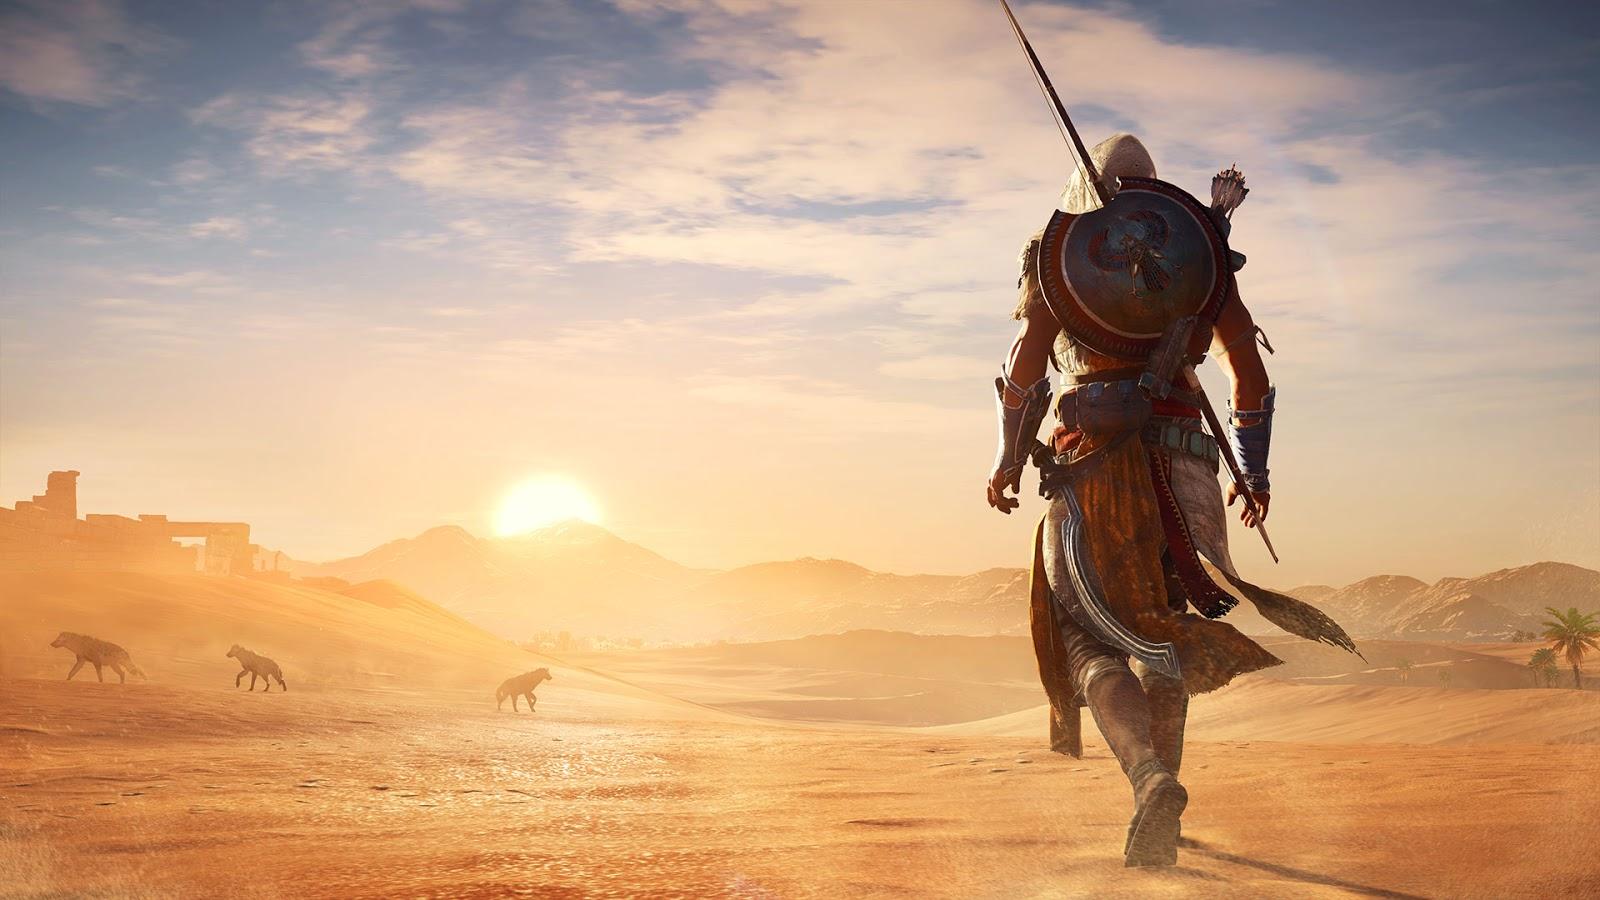 Beautiful   Wallpaper Horse Assassin'S Creed - ac_media_screen-bayekDesert_ncsa  Snapshot_238291.jpg